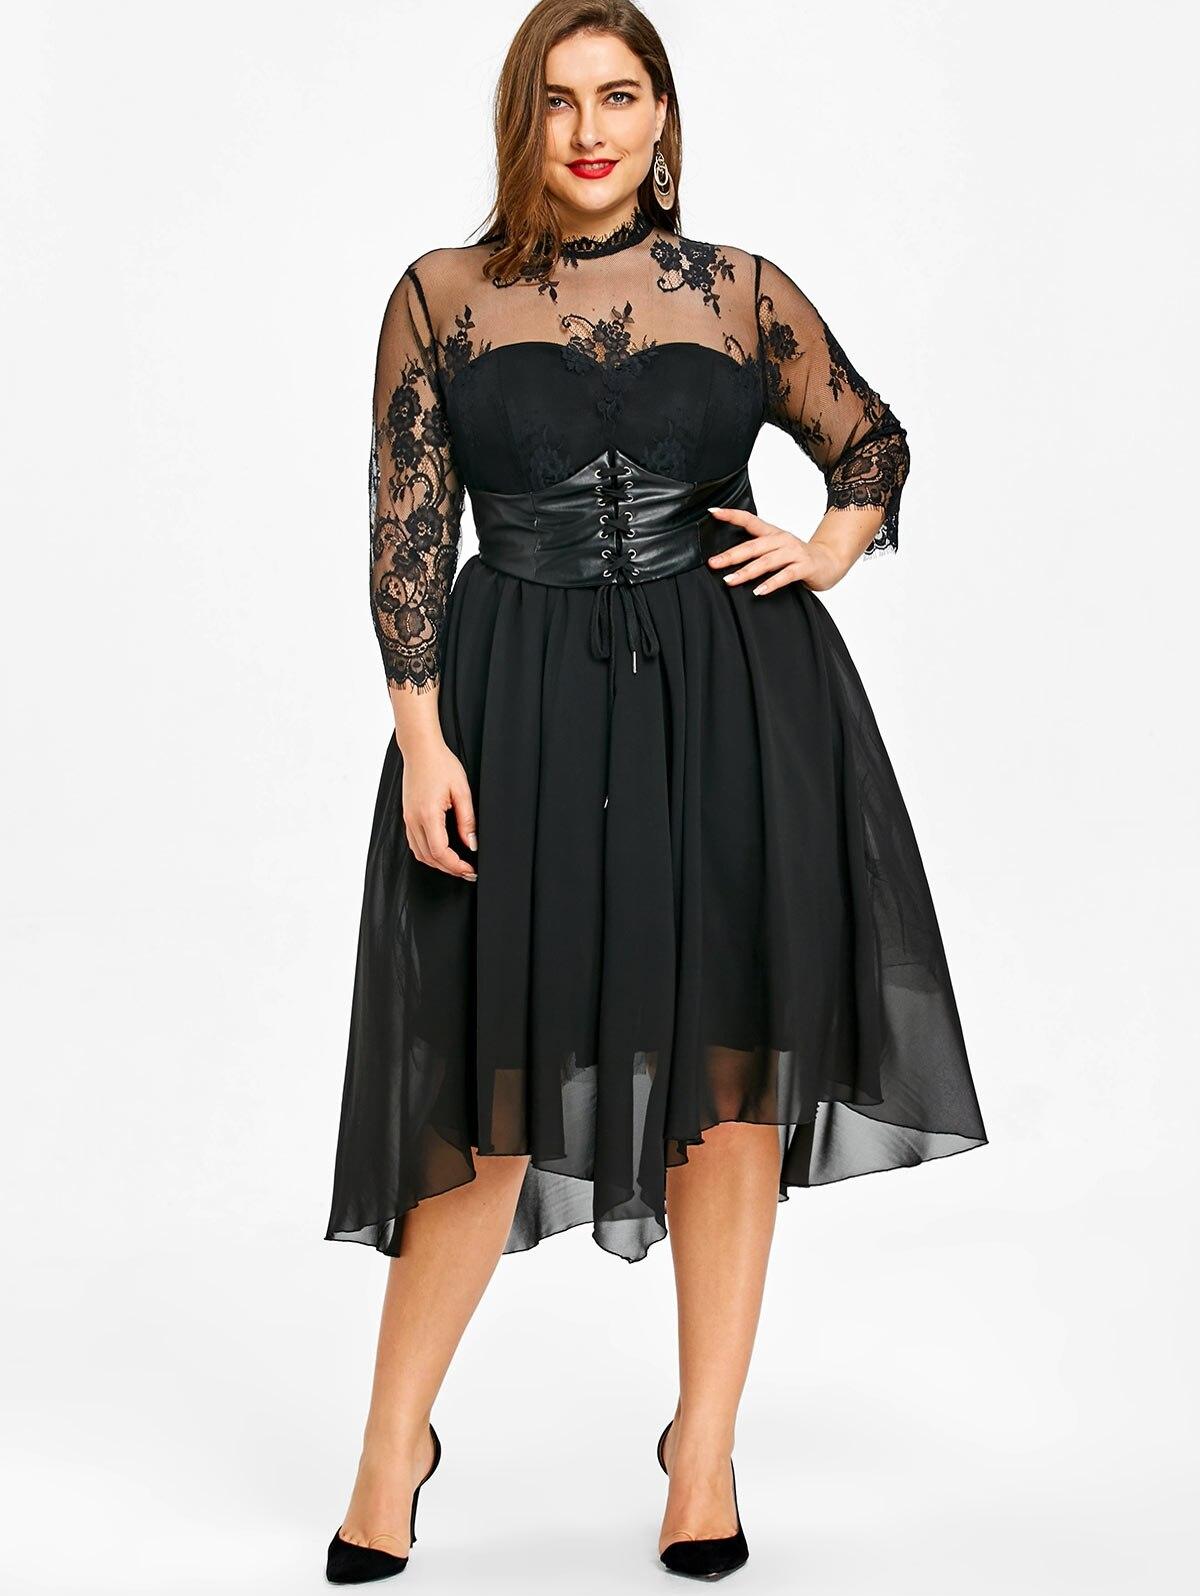 Gothic Criss Cross Panel Lace Plus Size Dress Women Empire Waist Sexy Party Dress Big Size 3XL 4XL 5XL robe femme empire waist criss cross front casual dress